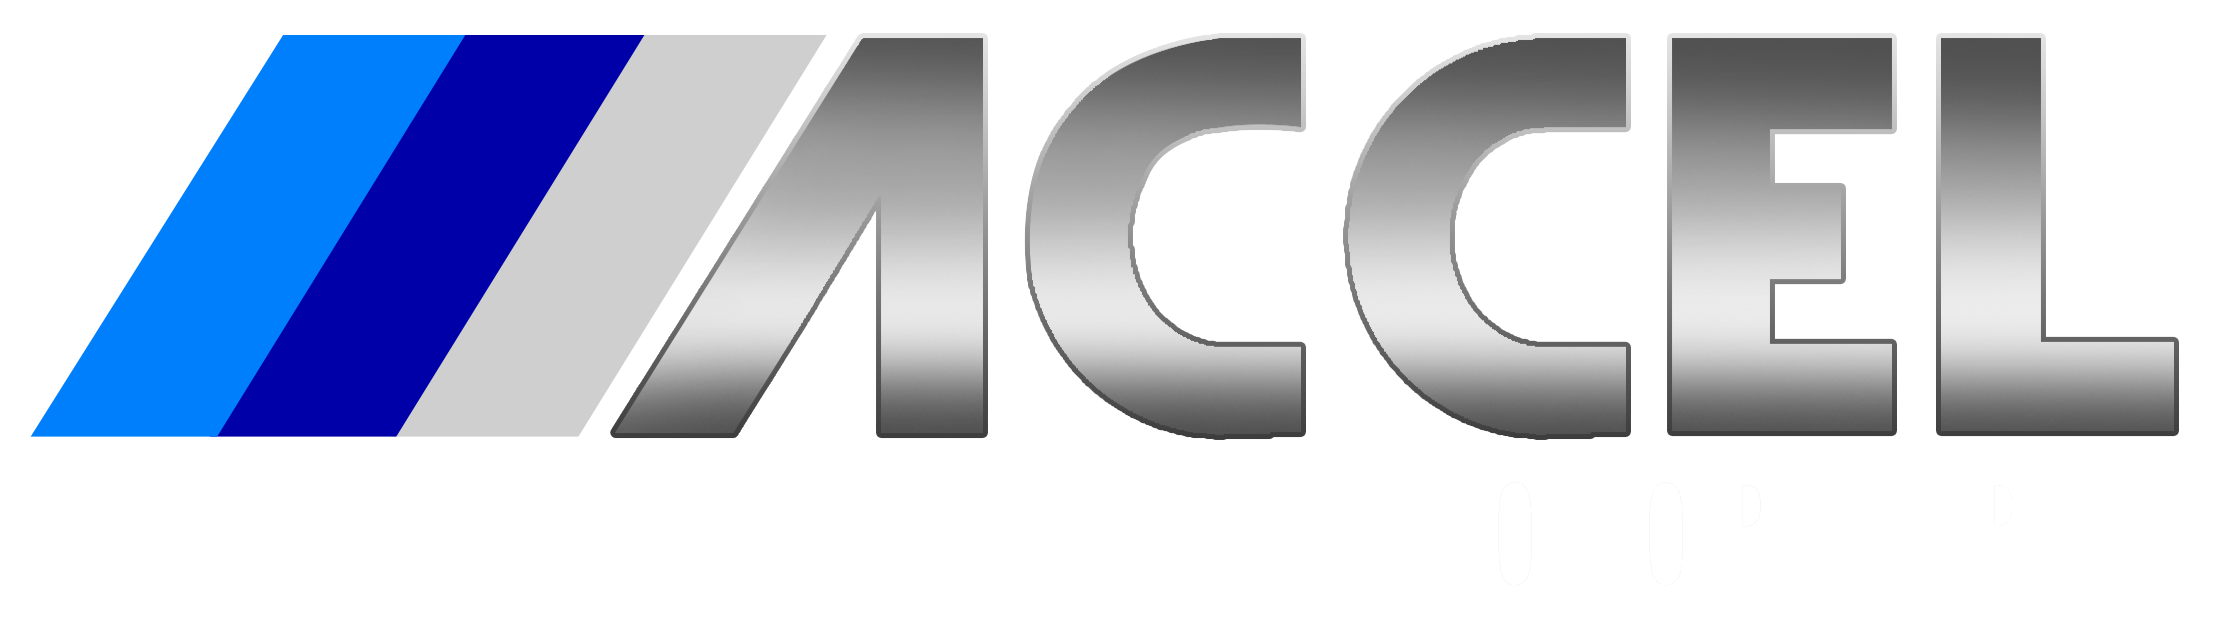 Bmw repair service in dallas plano richardson logo sciox Image collections